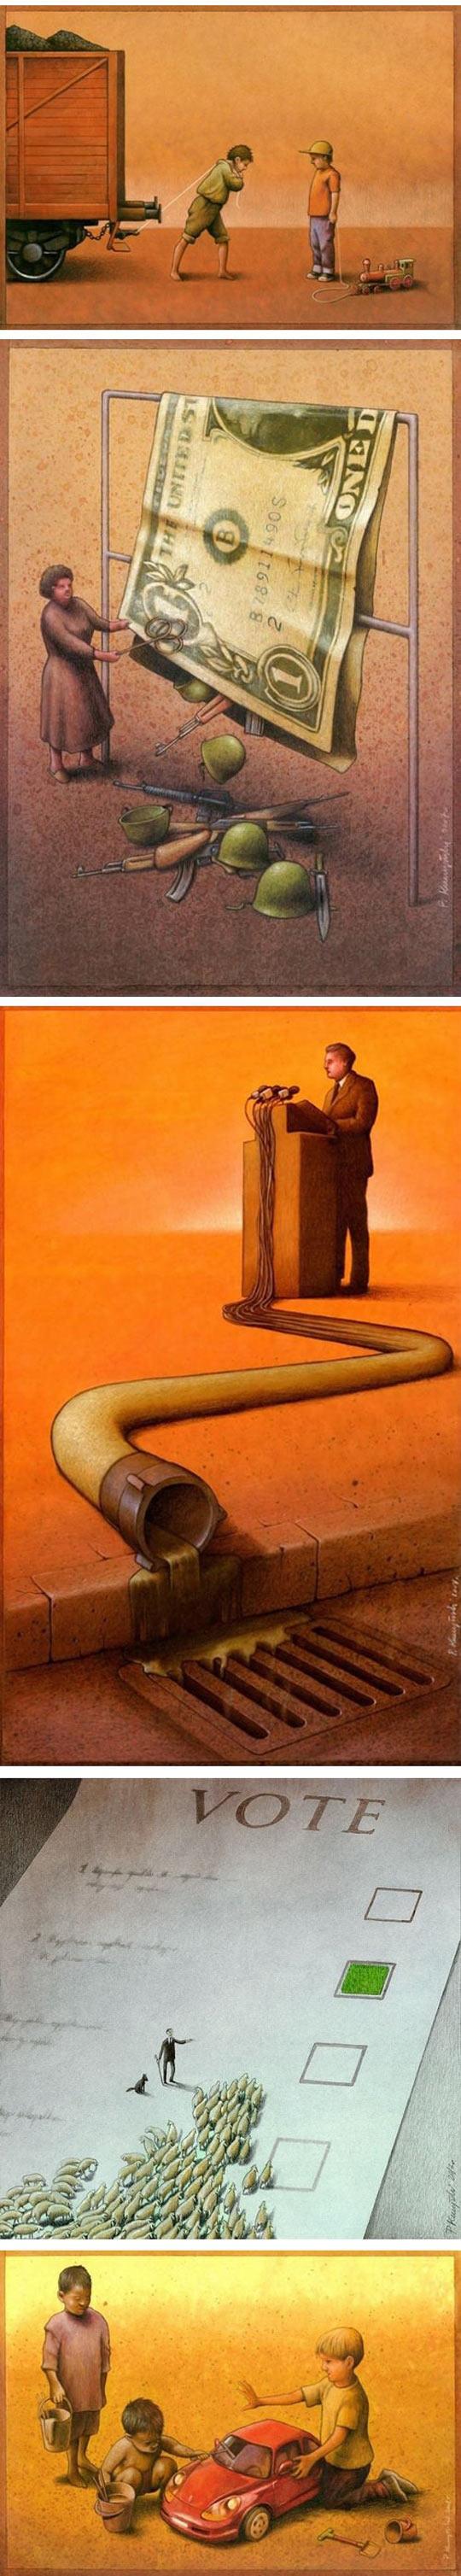 funny-Paul-Kuczynski-illustration-politics